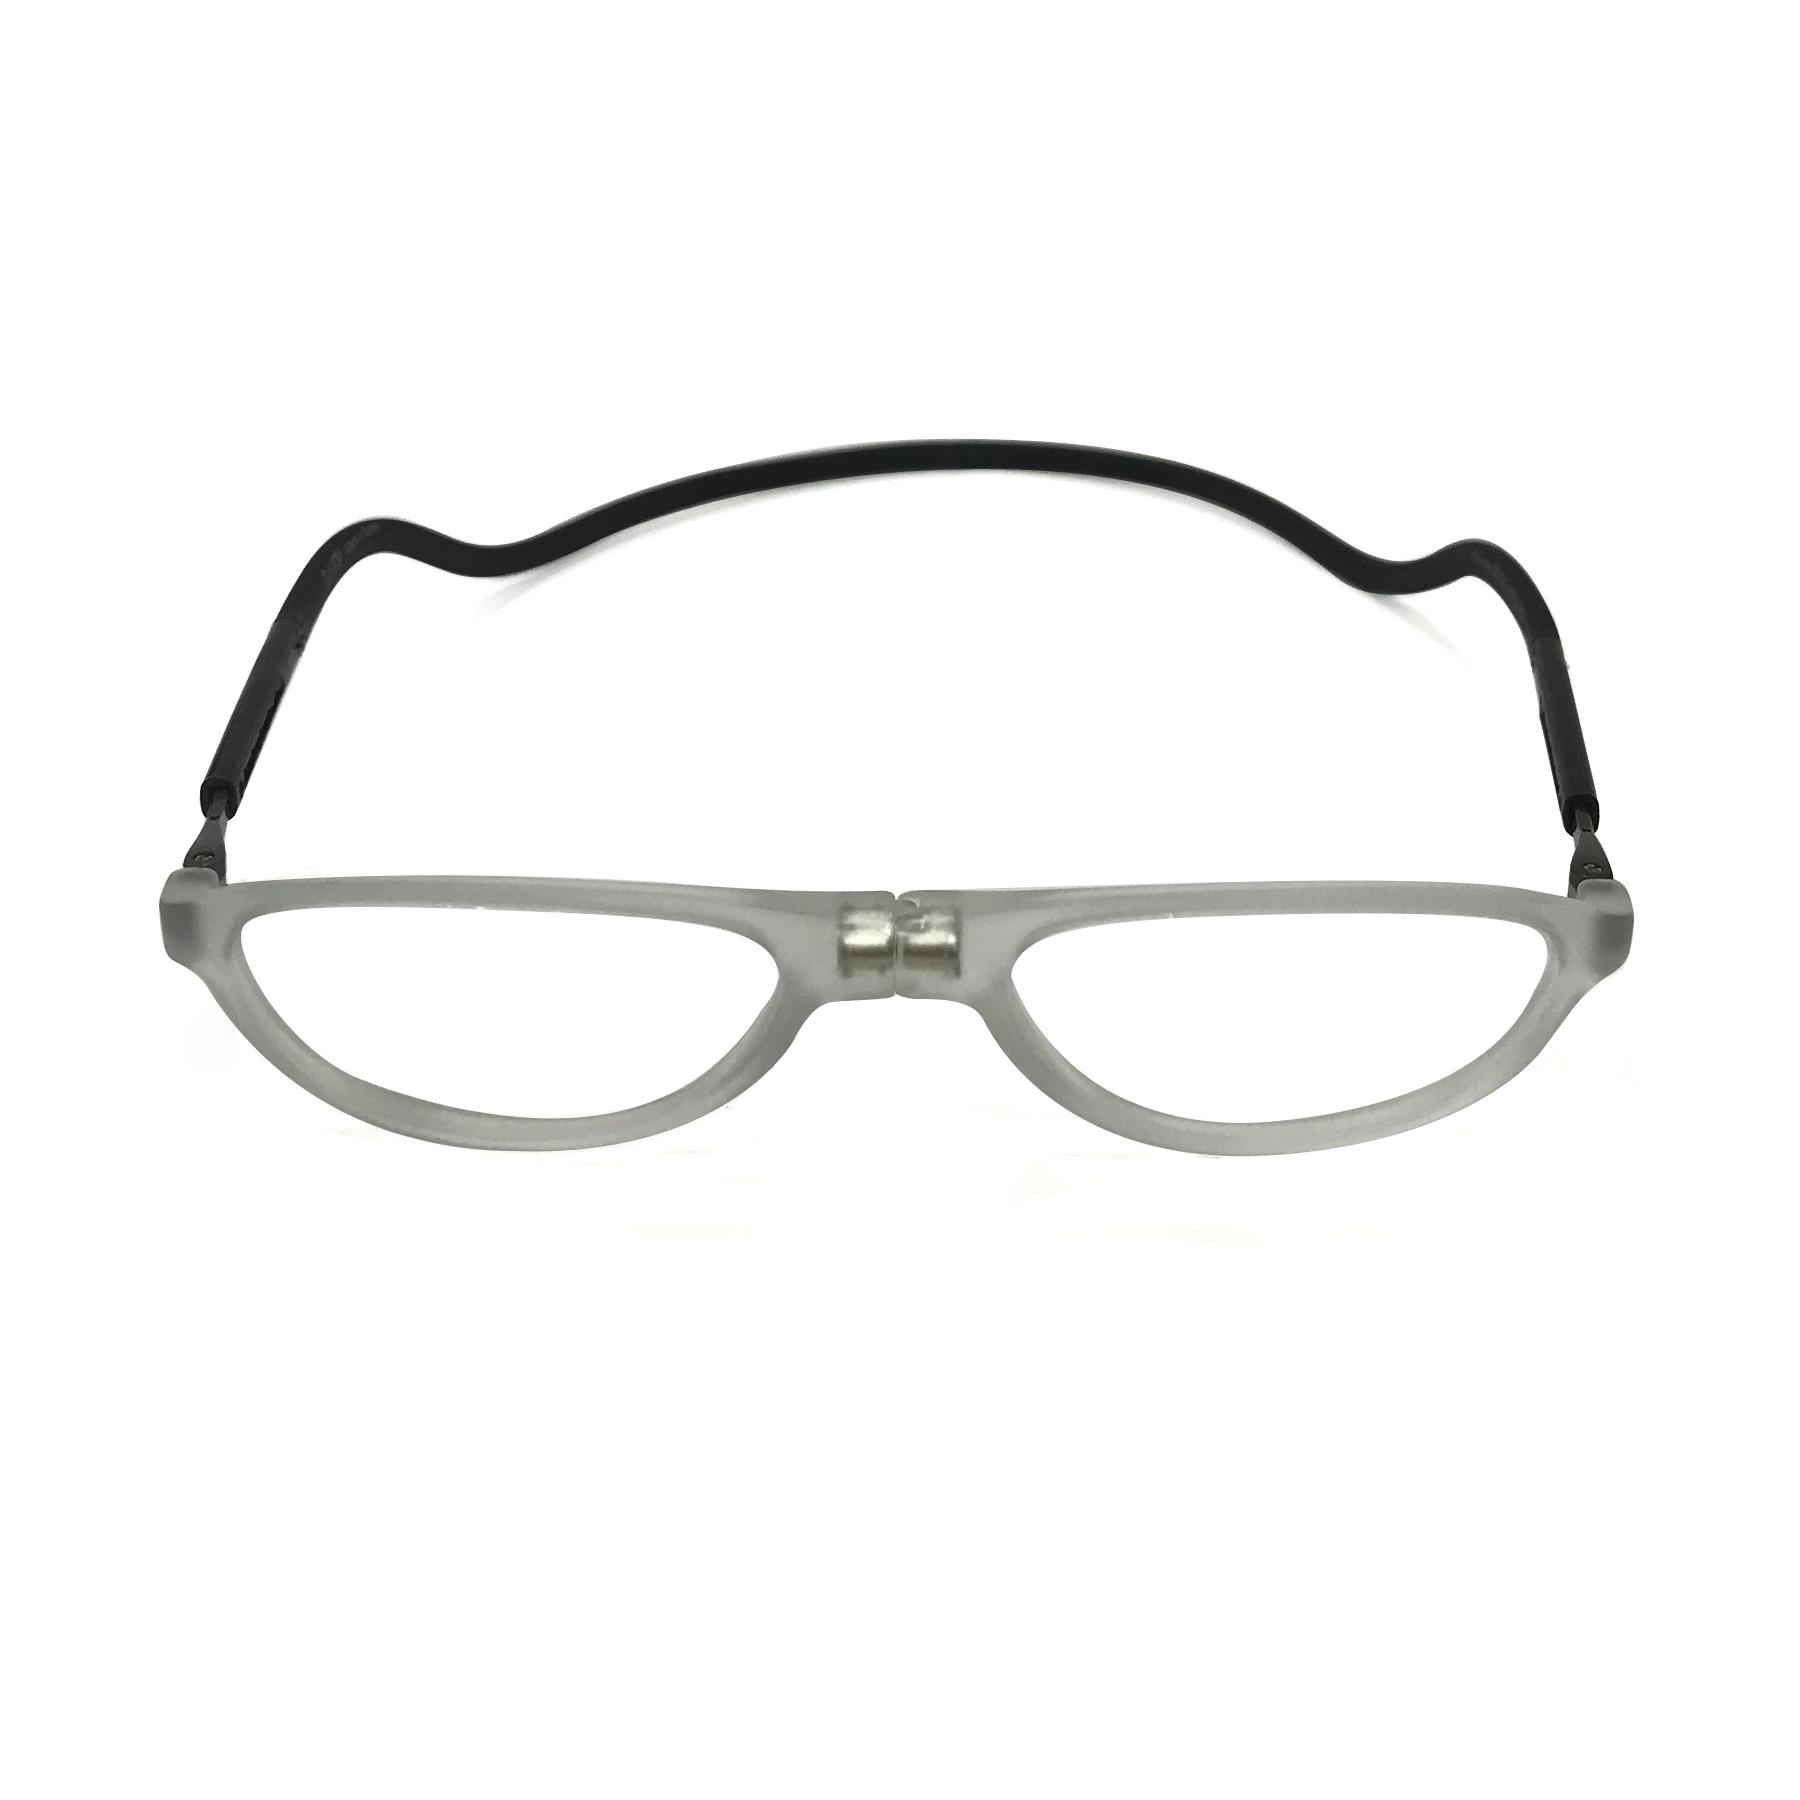 Vinaldi Plus 604 Optical Frames